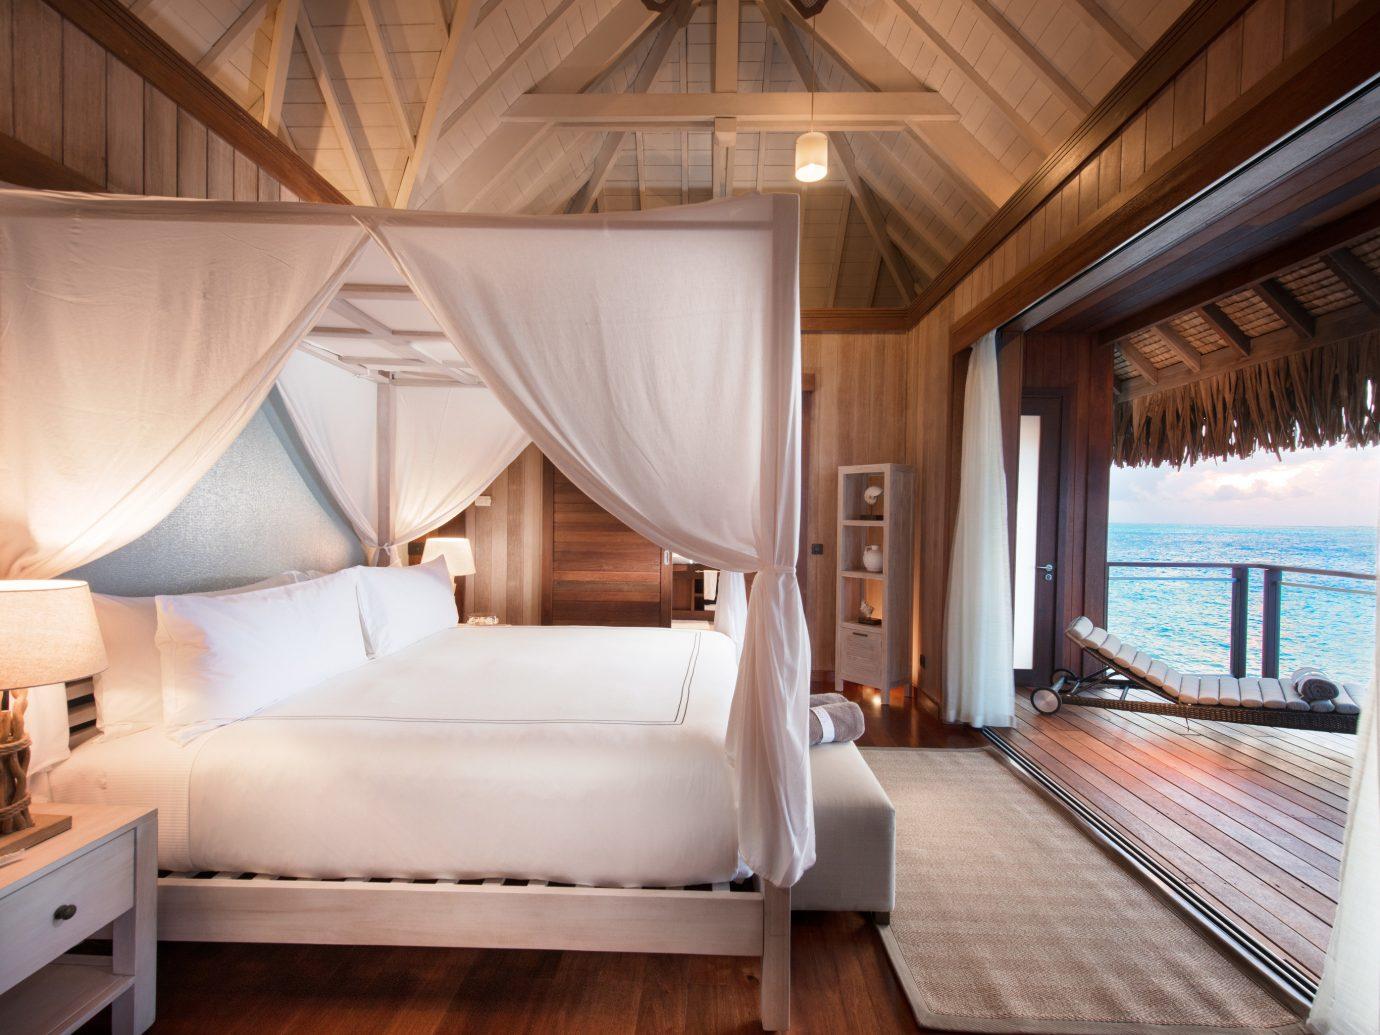 Hotels Indoor Bed Floor Room Bedroom Suite Architecture Interior Design Ceiling Estate Hotel Real Wood